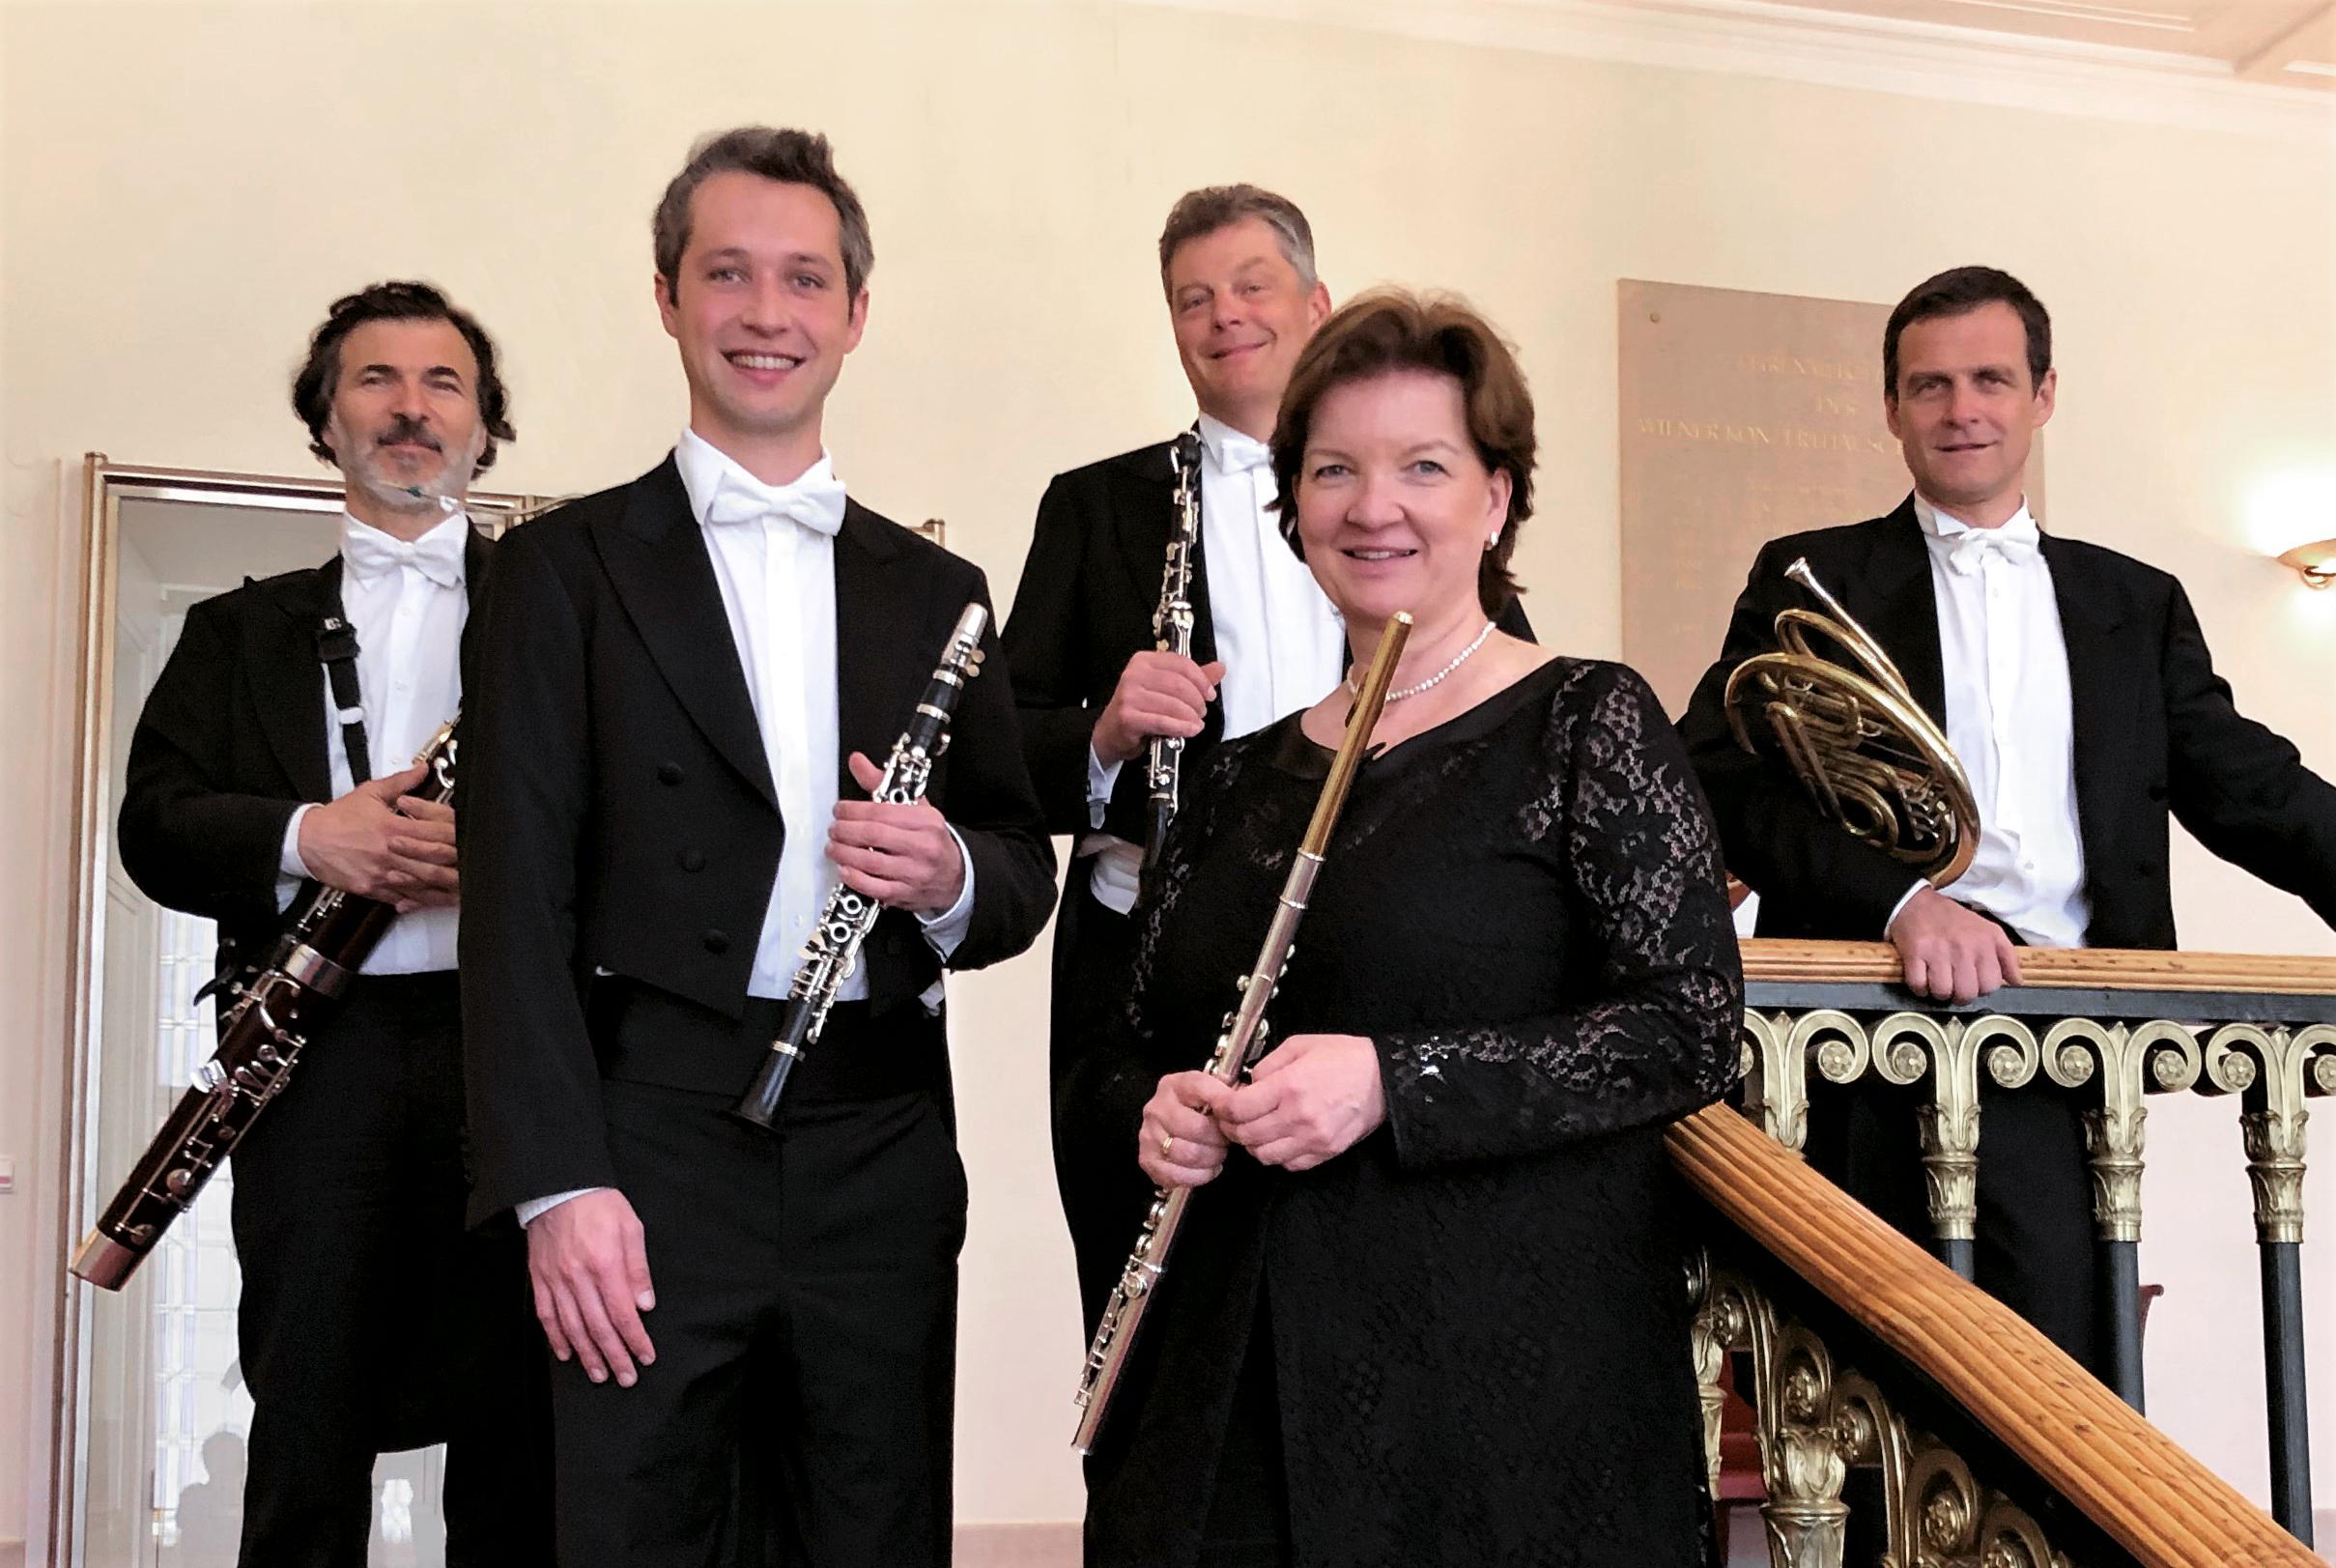 Wiener Symphoniker - Quintetto Sinfonico